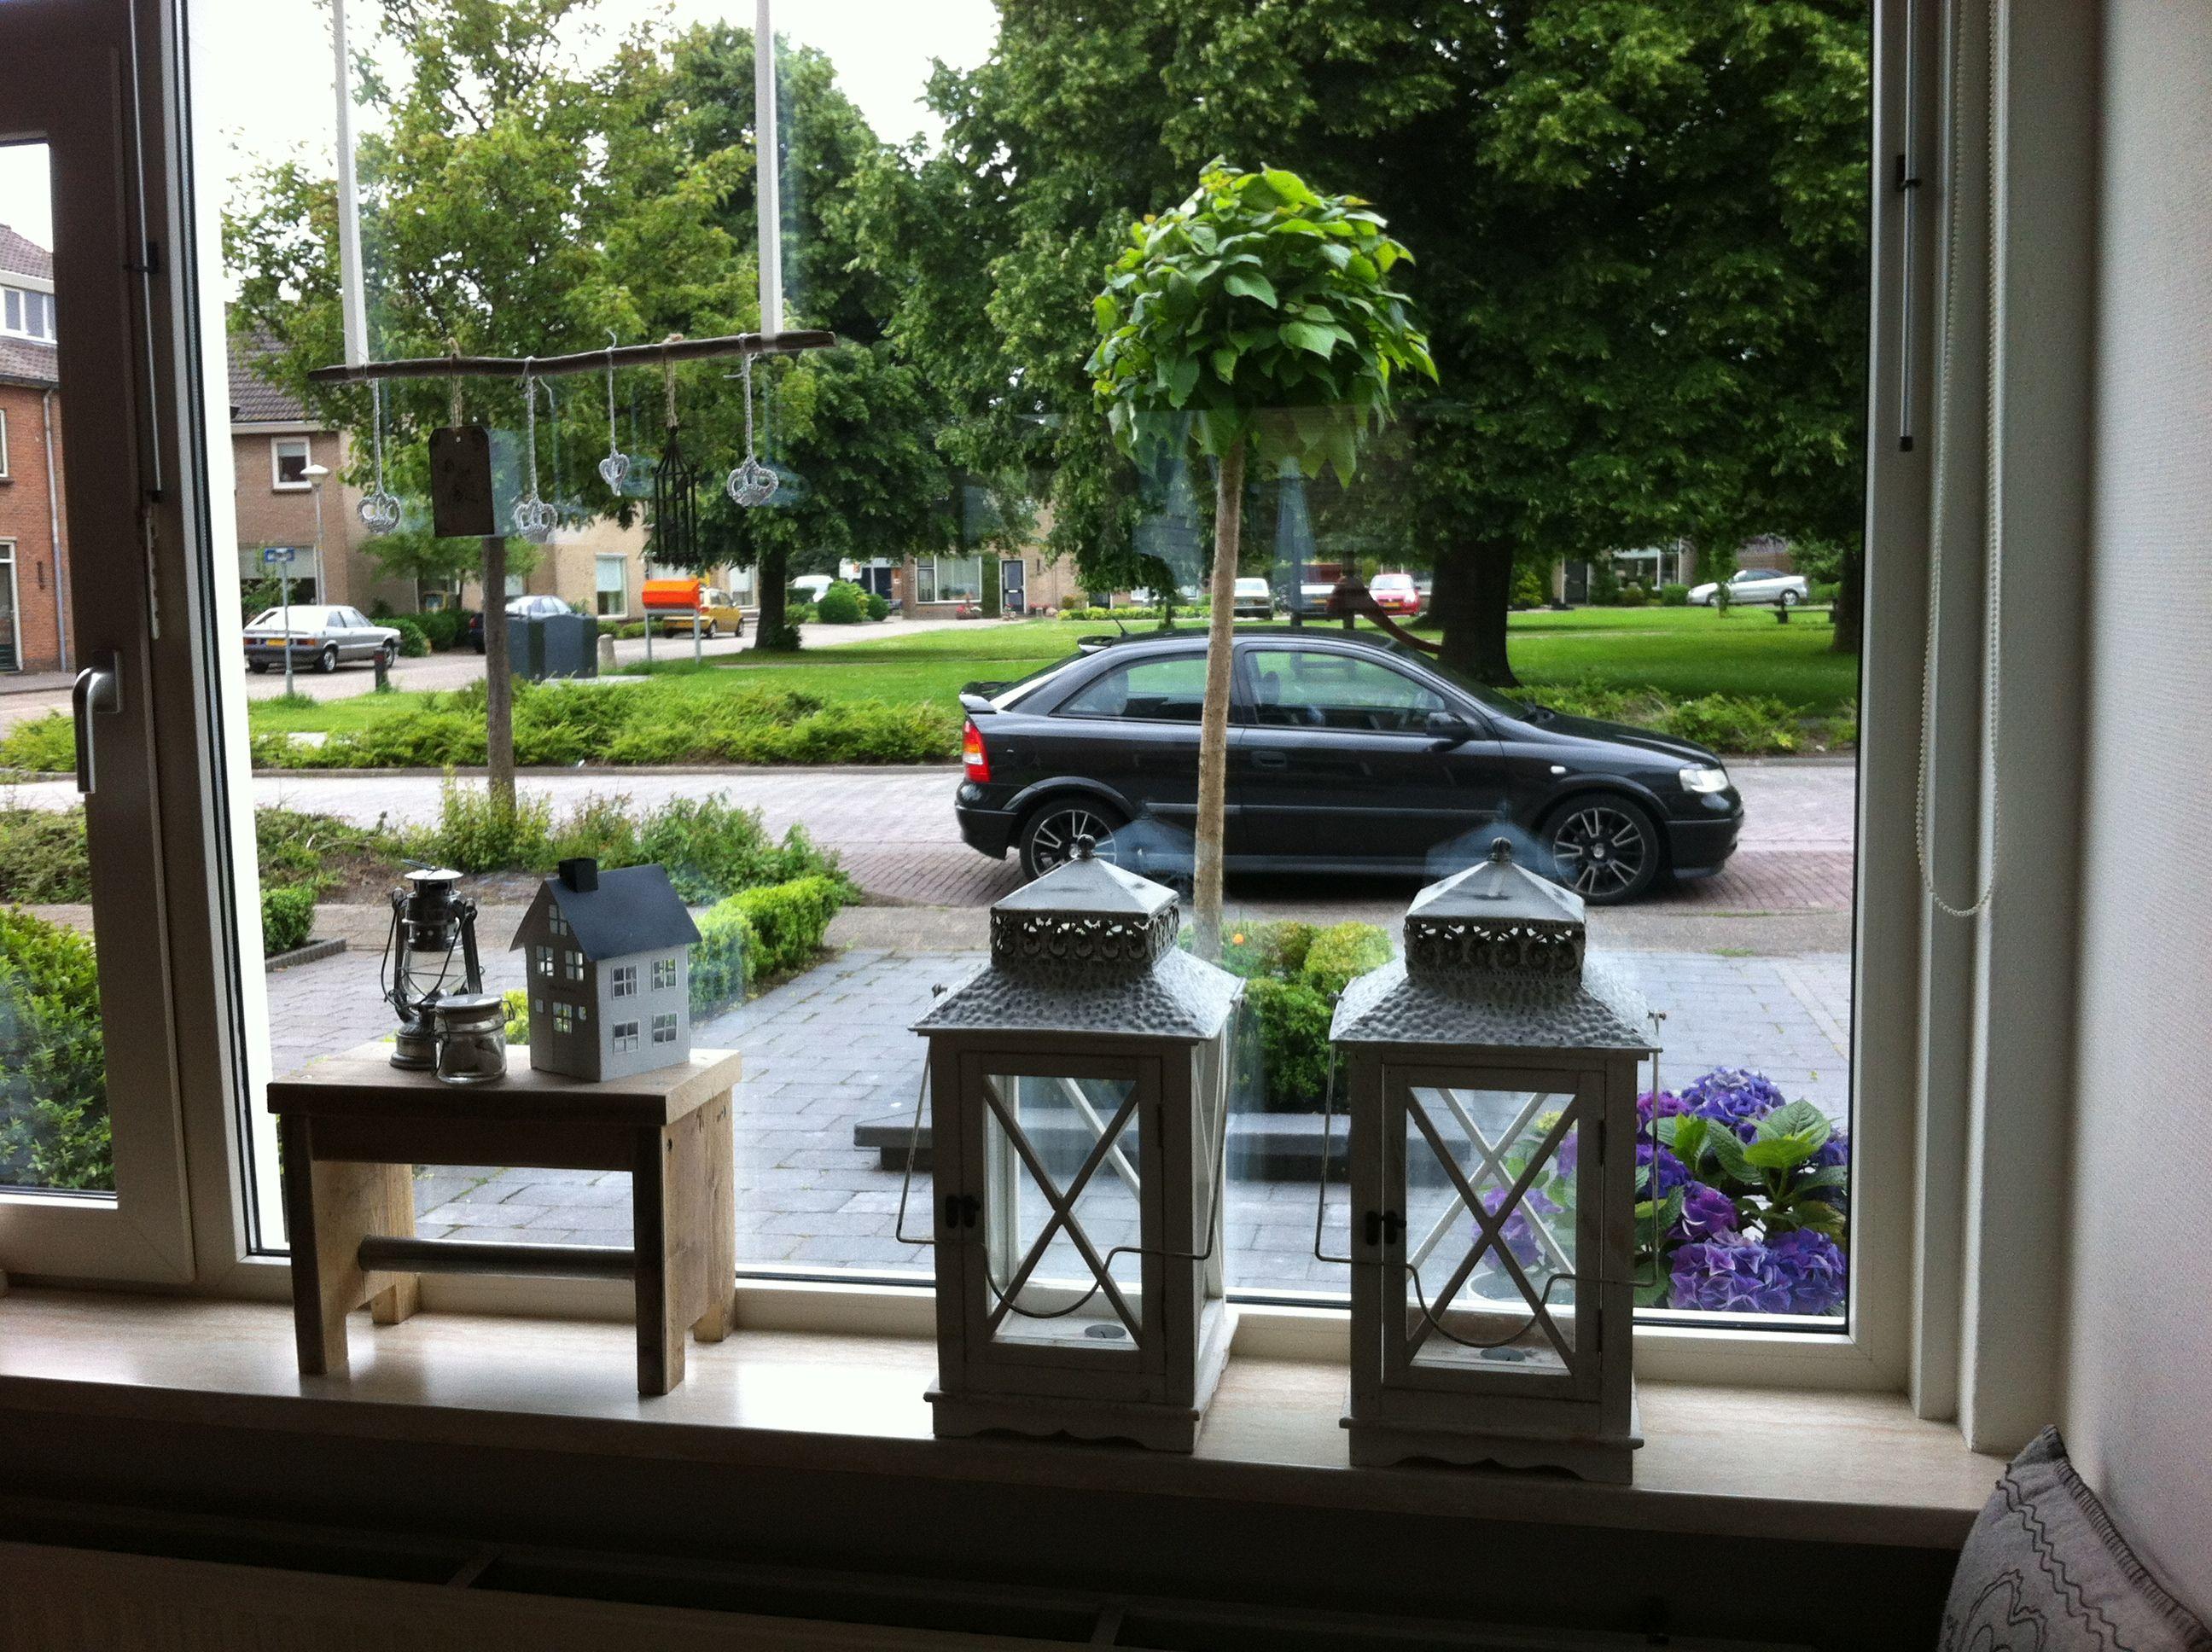 Vensterbank raam vensterbank deco pinterest for Decoratie op vensterbank